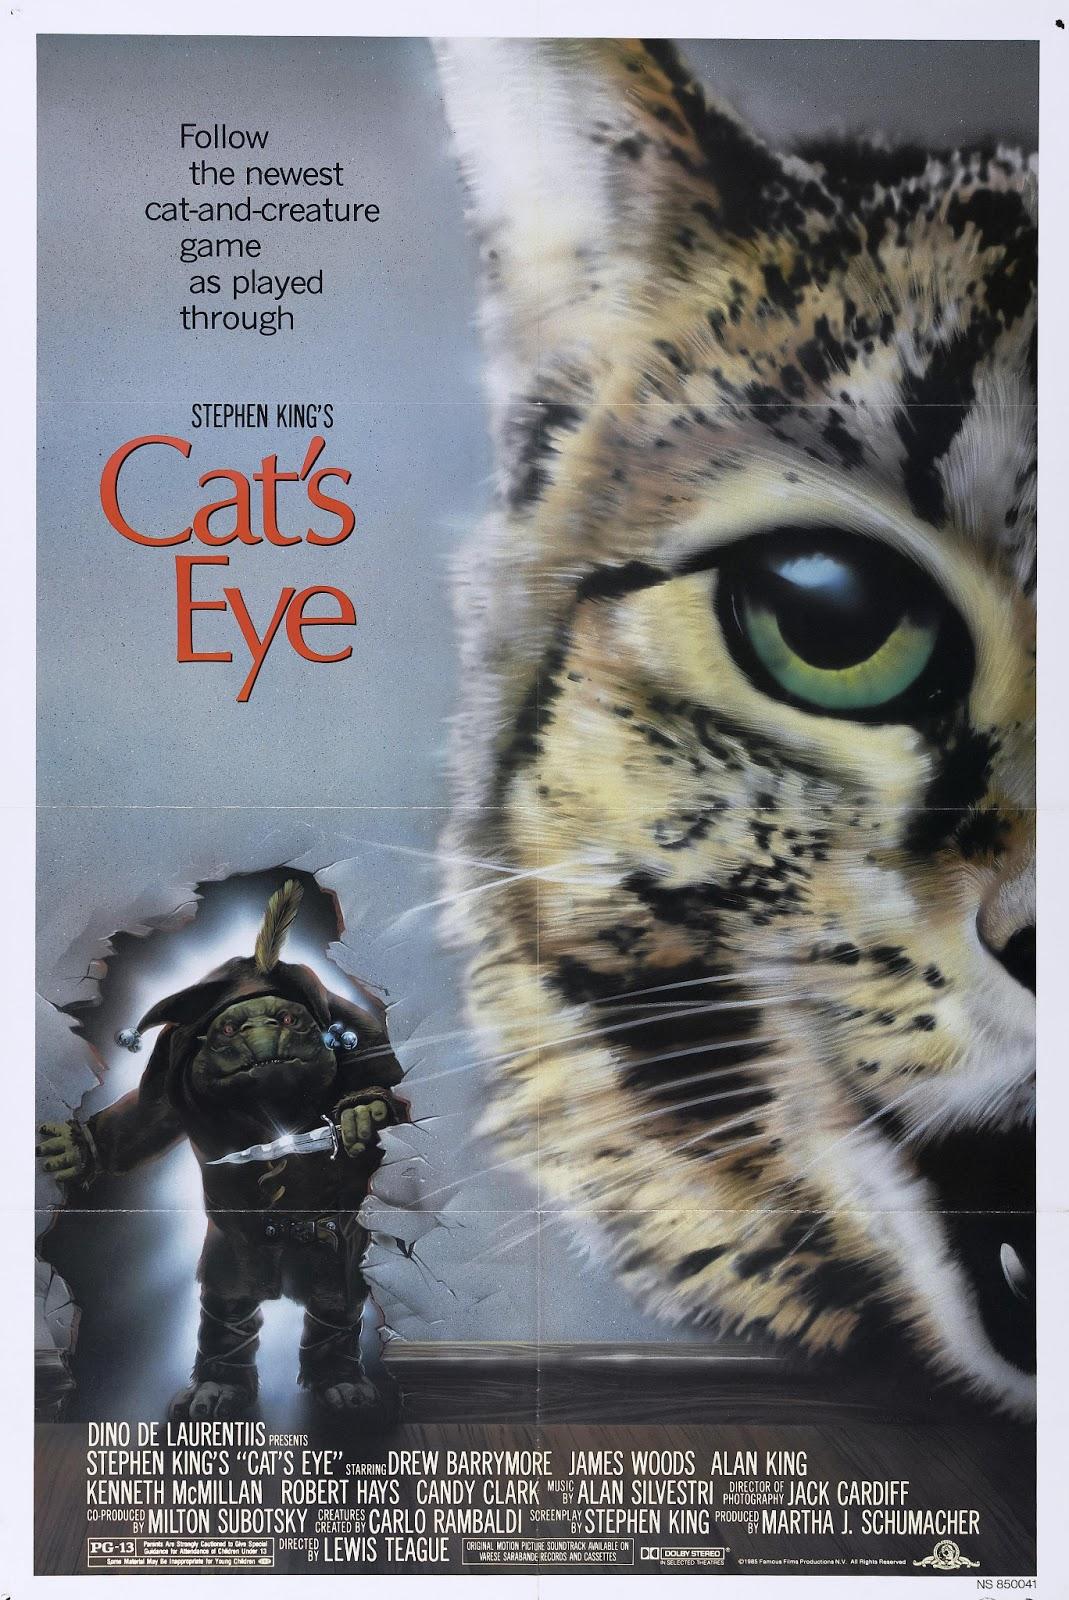 http://1.bp.blogspot.com/-hfwlTSd70V0/UWGtt3wnwXI/AAAAAAAAAys/MteJUVYUd-U/s1600/cats_eye_poster_01.jpg